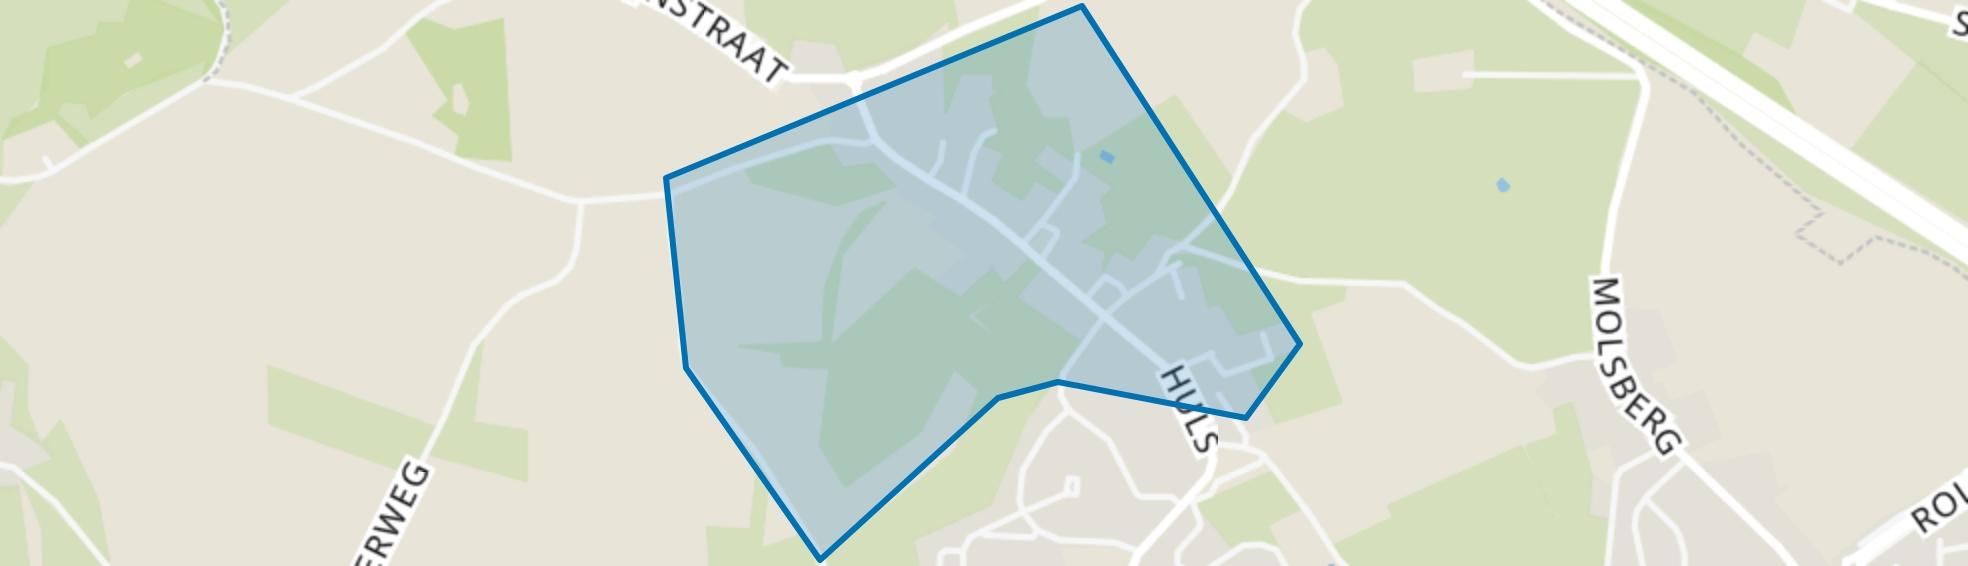 Huls, Simpelveld map